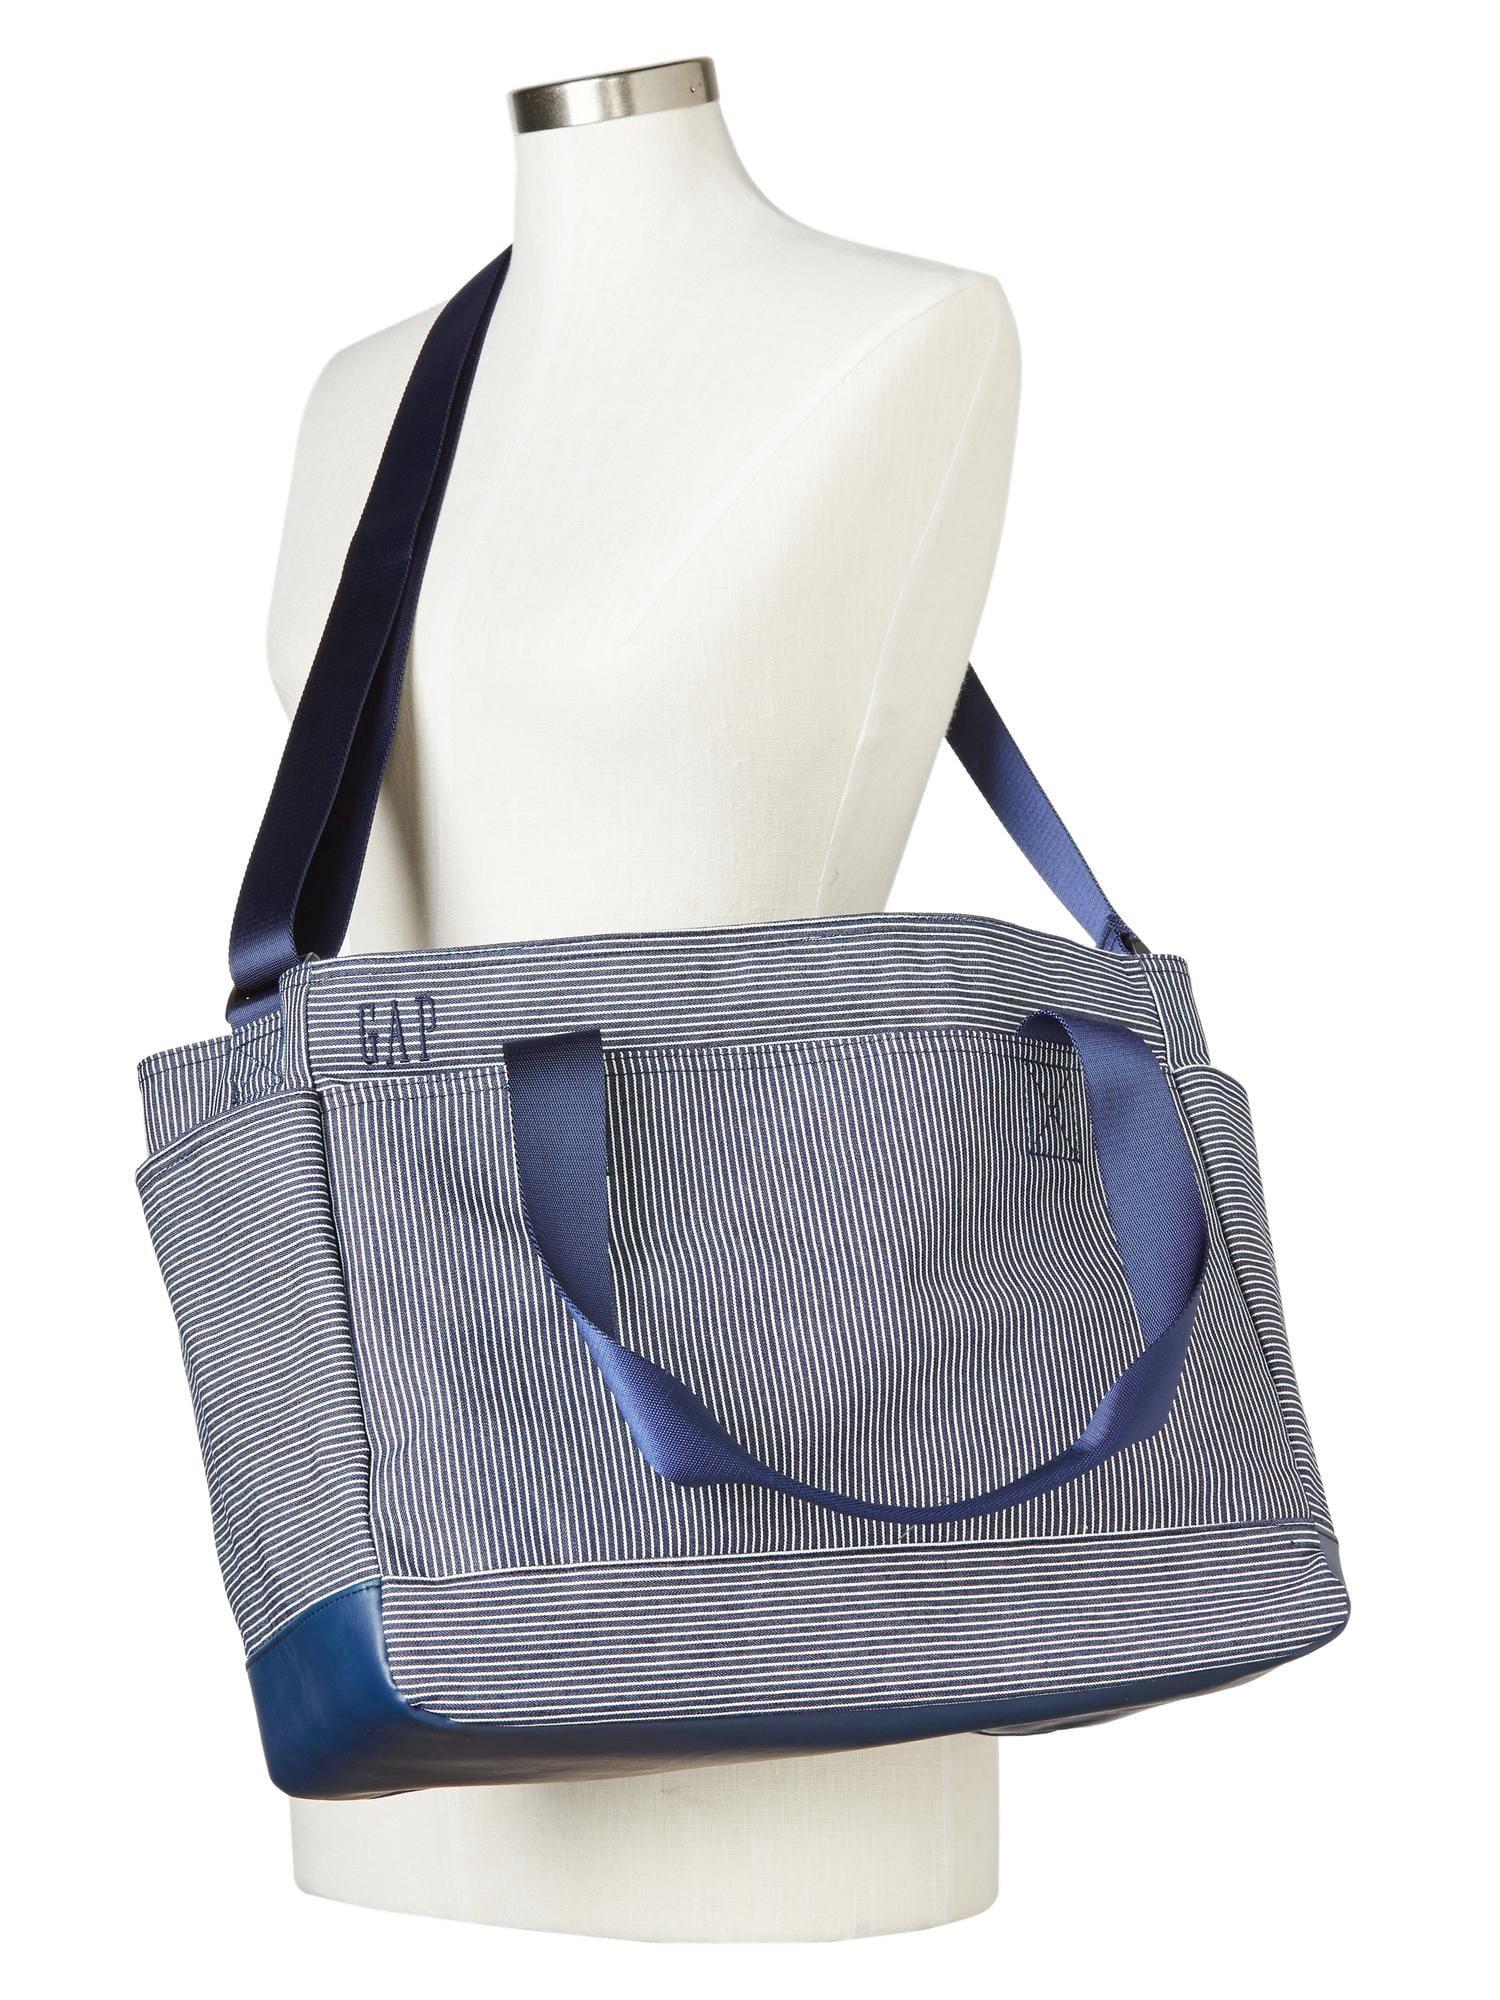 2f5d6edf83 Gap Women Baby Girls Boys Railroad Stripe Diaper Bag - One Size ...